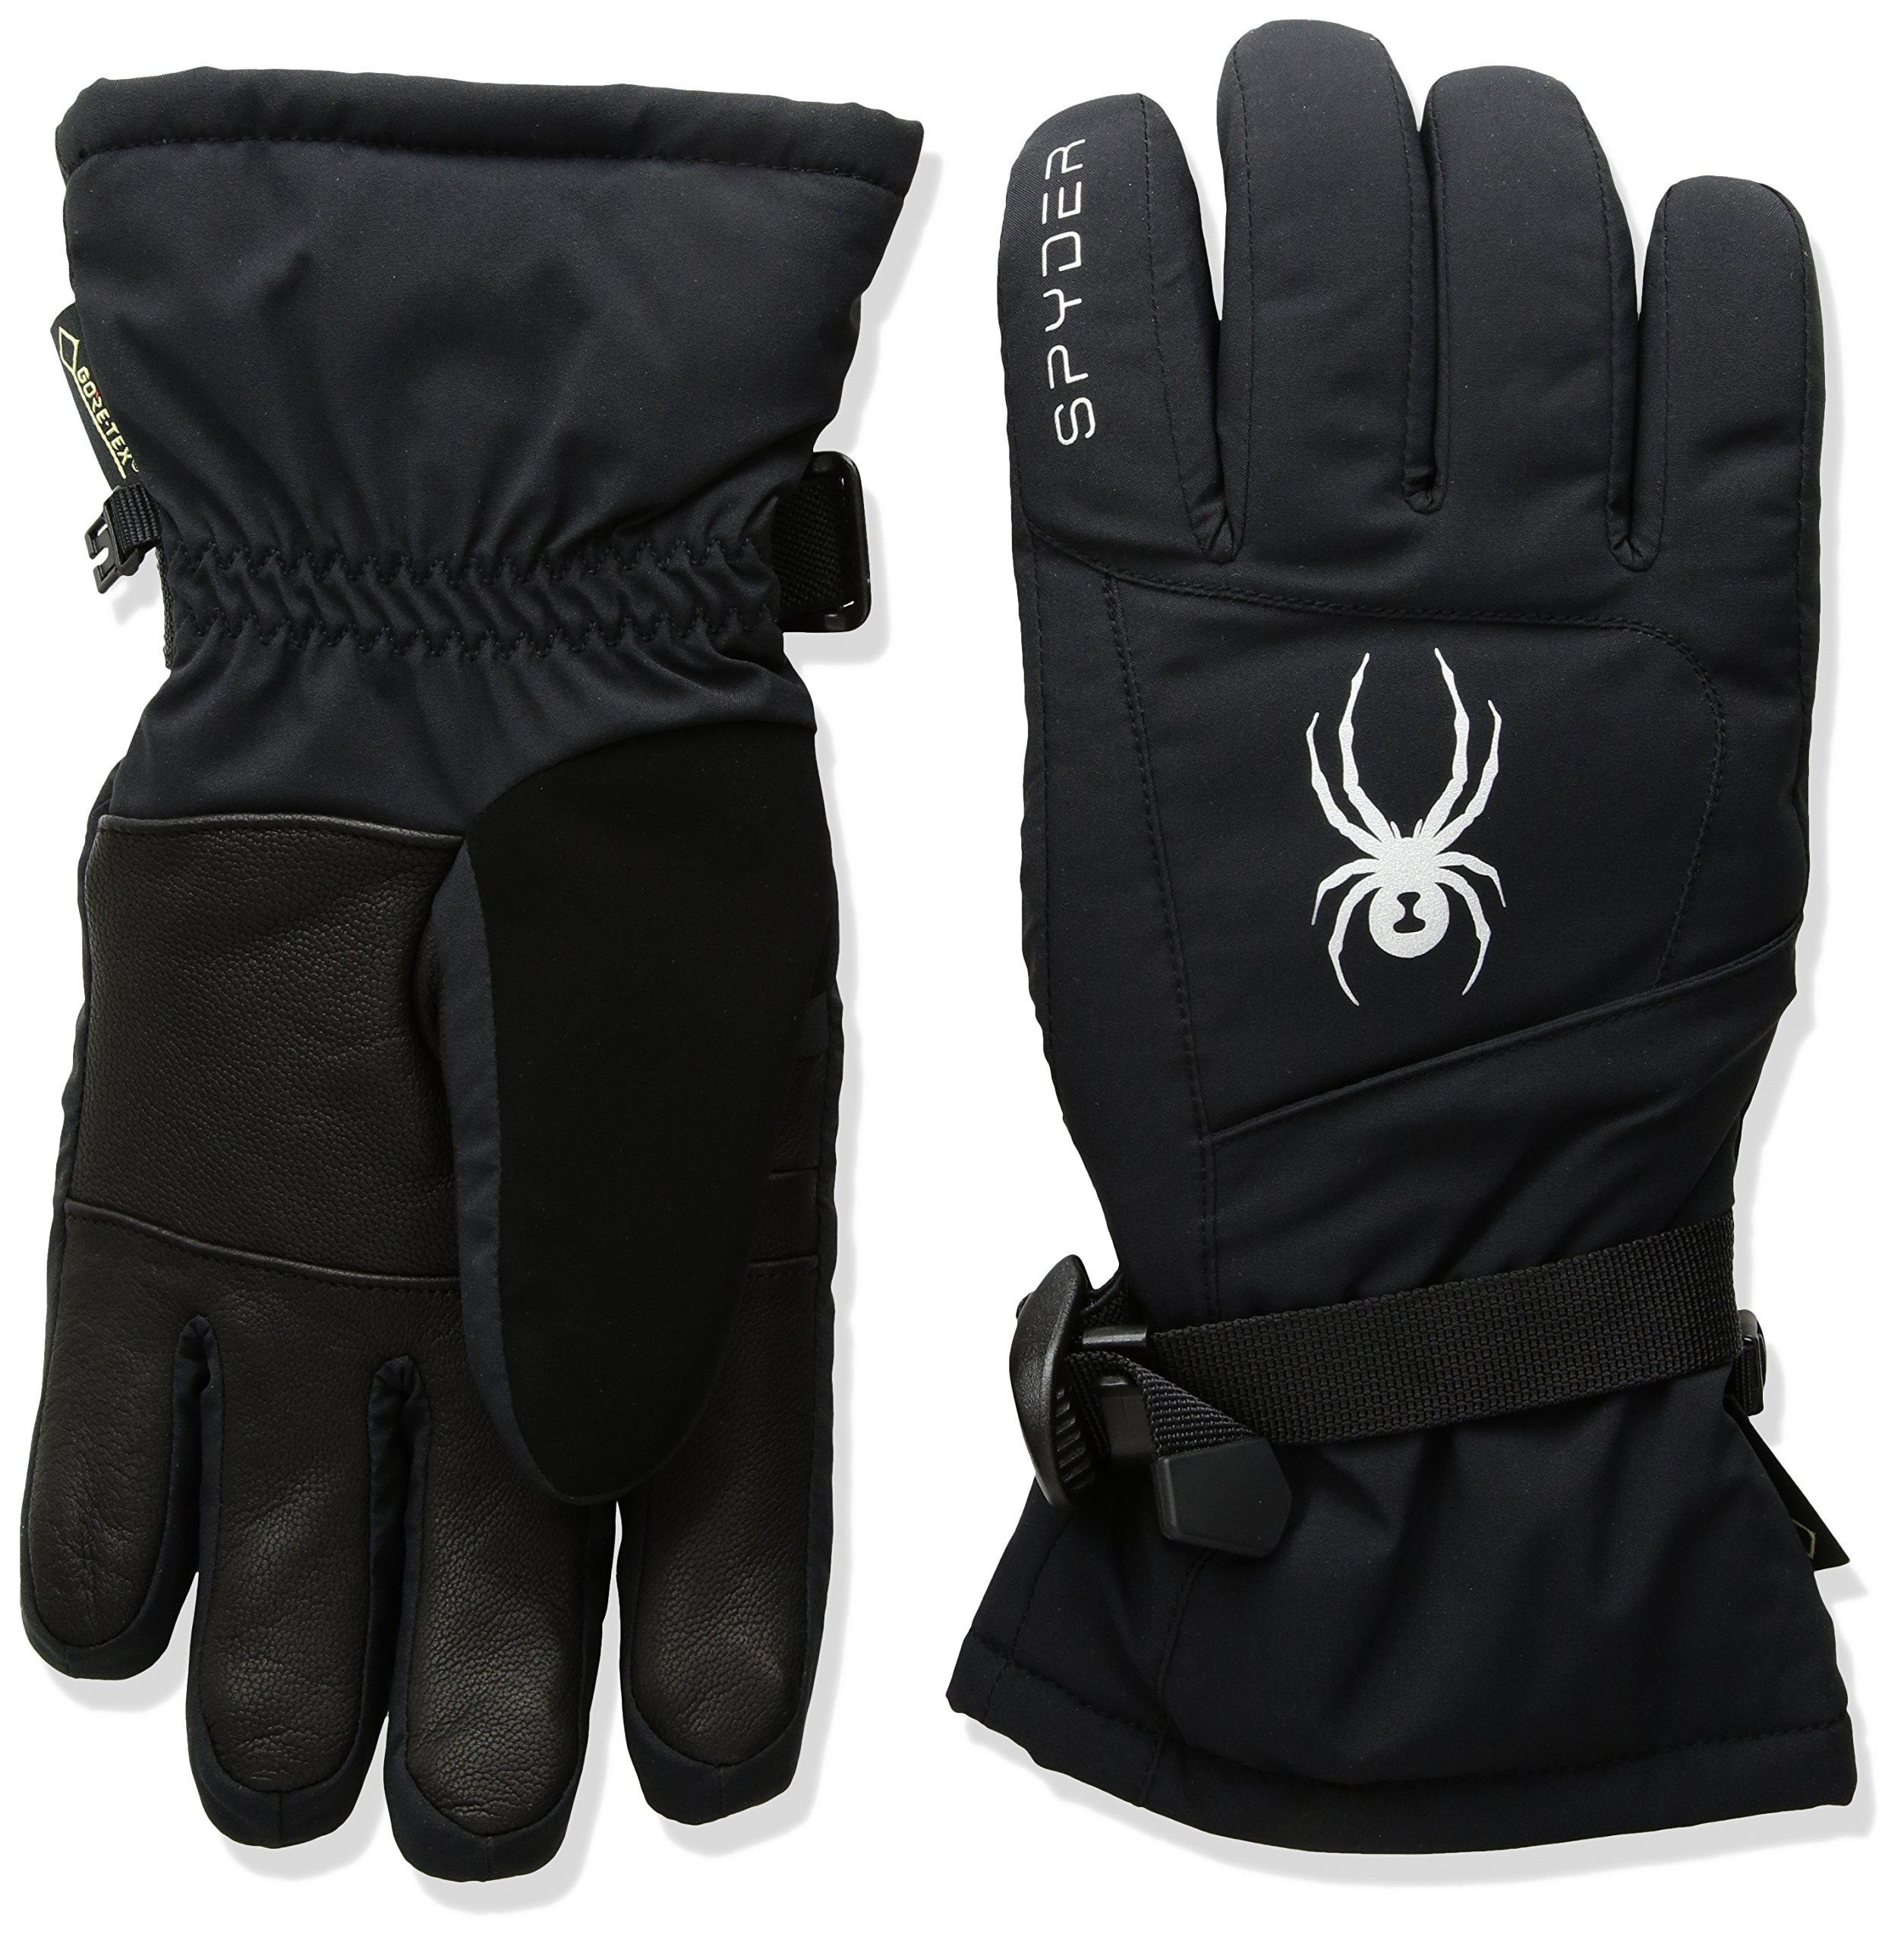 Spyder Women's Synthesis Gore-Tex Ski Glove, Black/Silver, Small